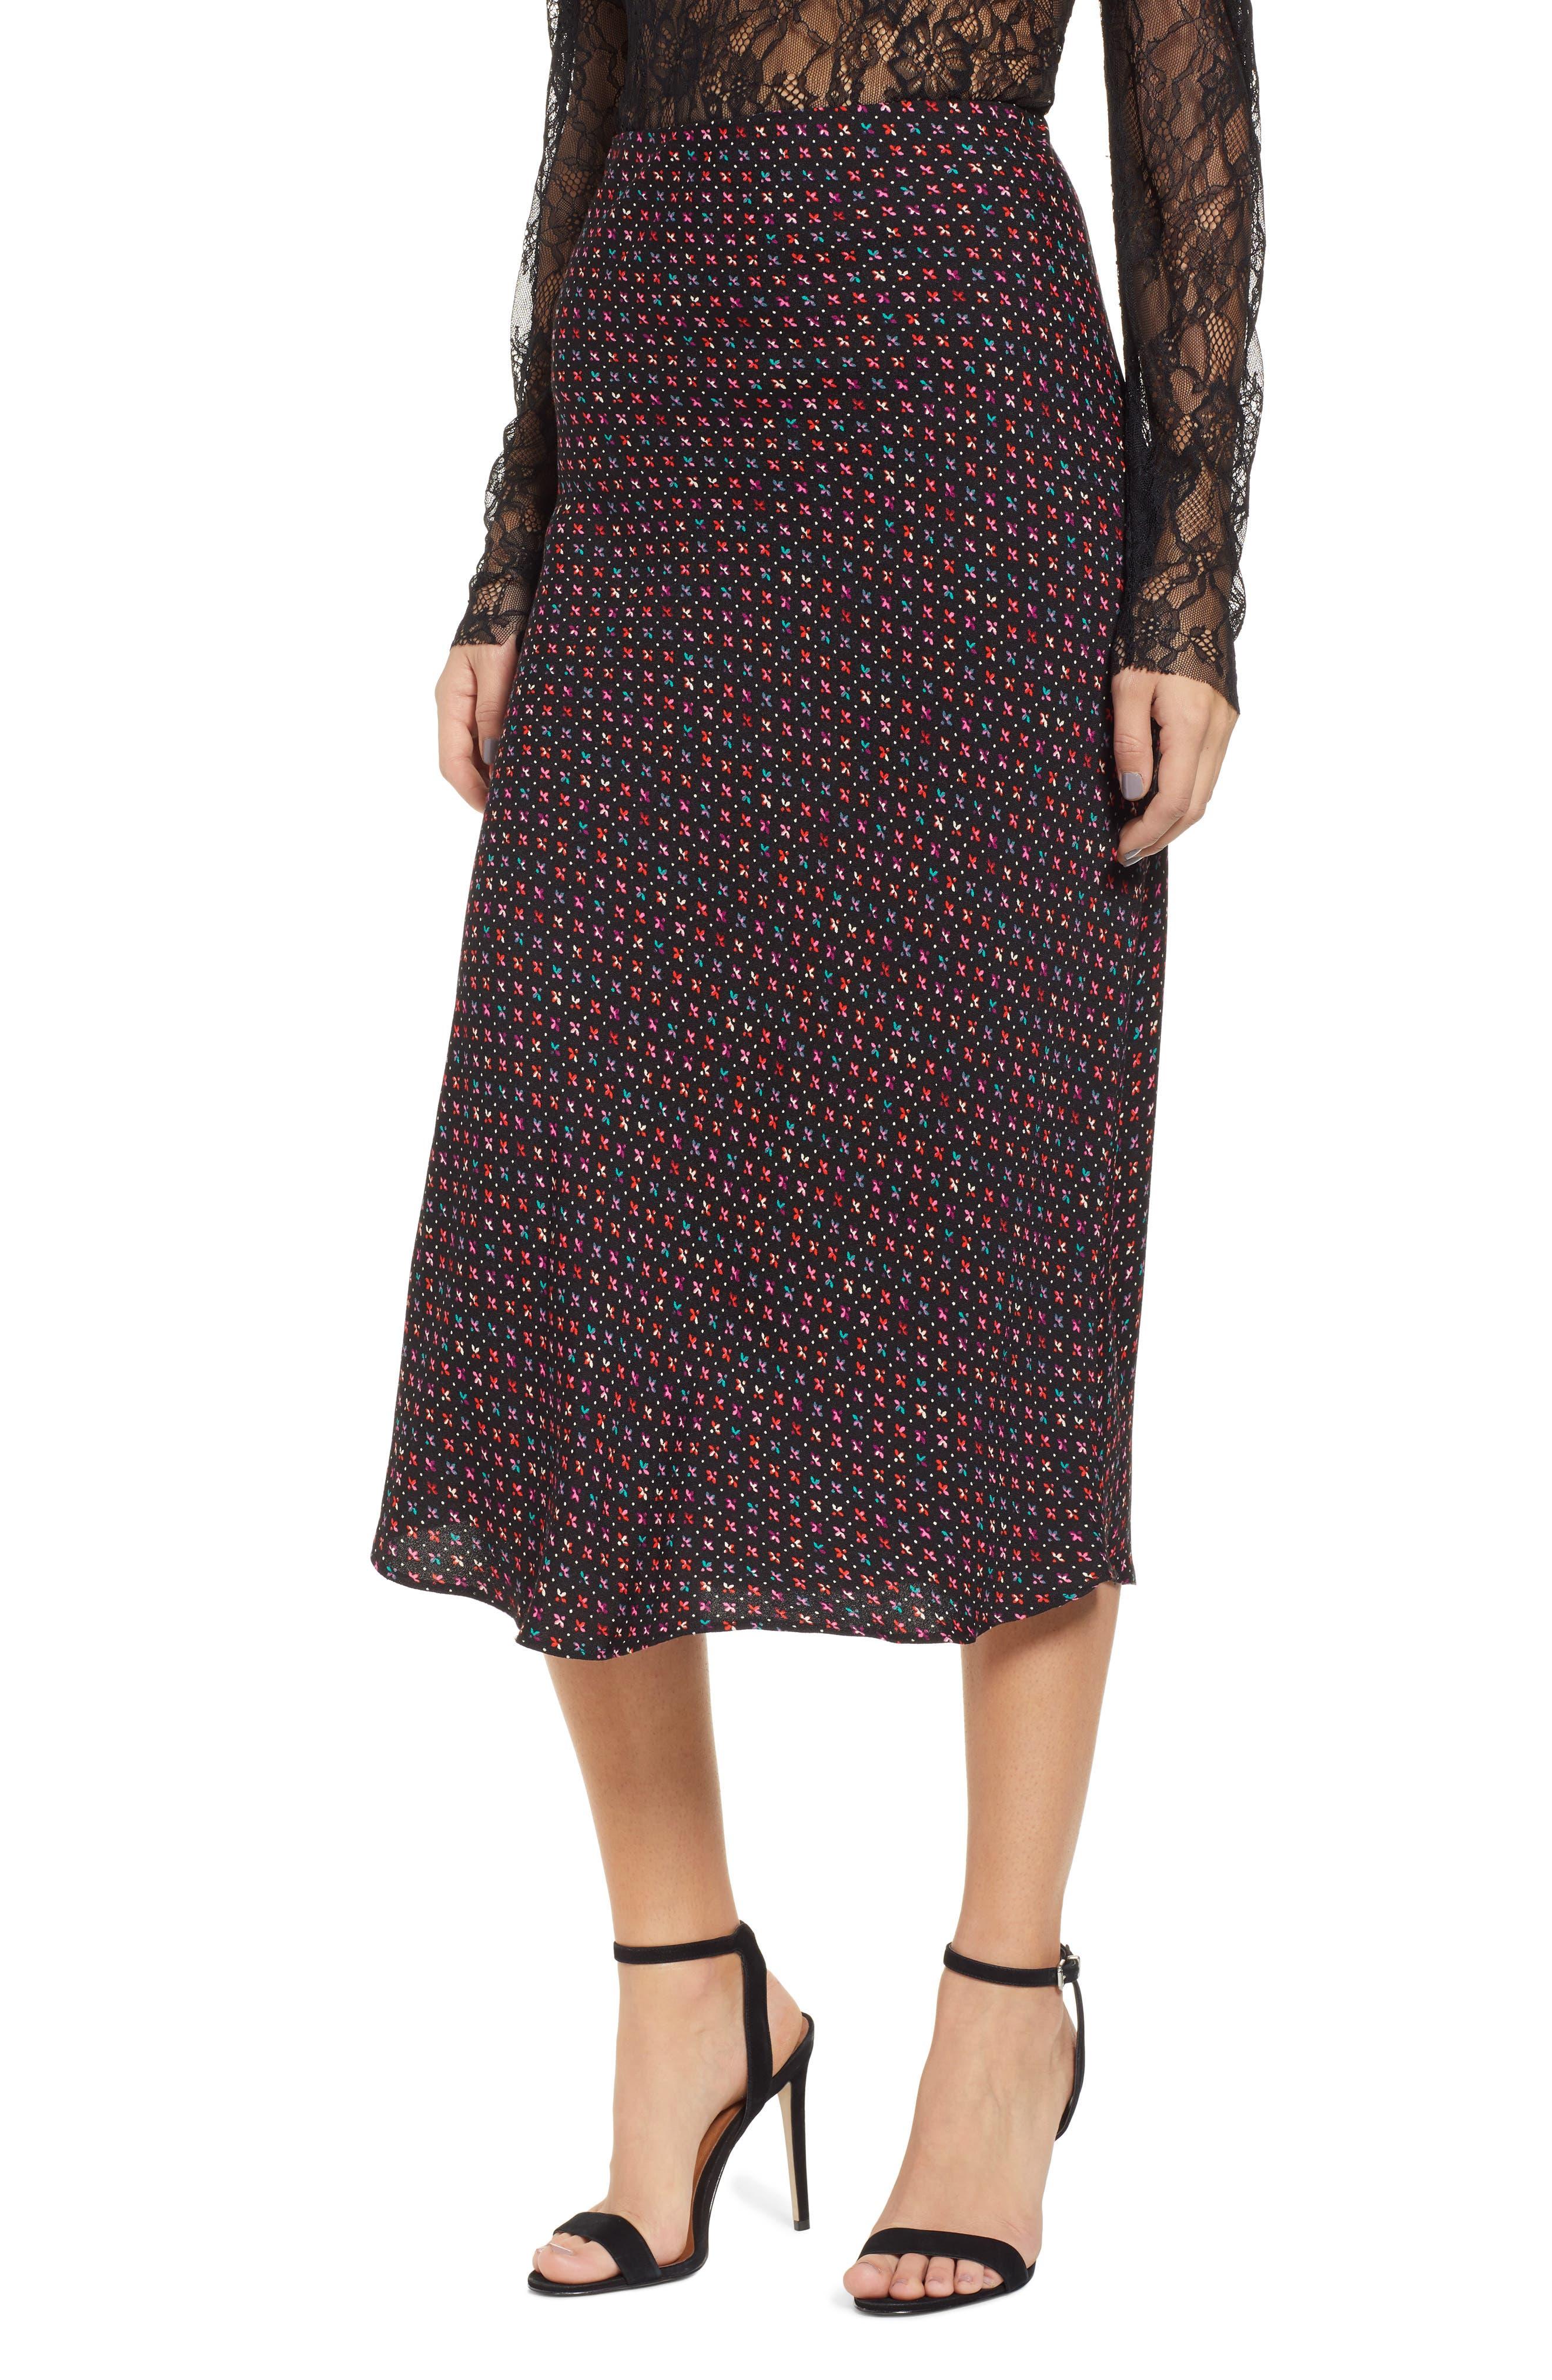 AFRM, Brynne Print Midi Skirt, Main thumbnail 1, color, 001